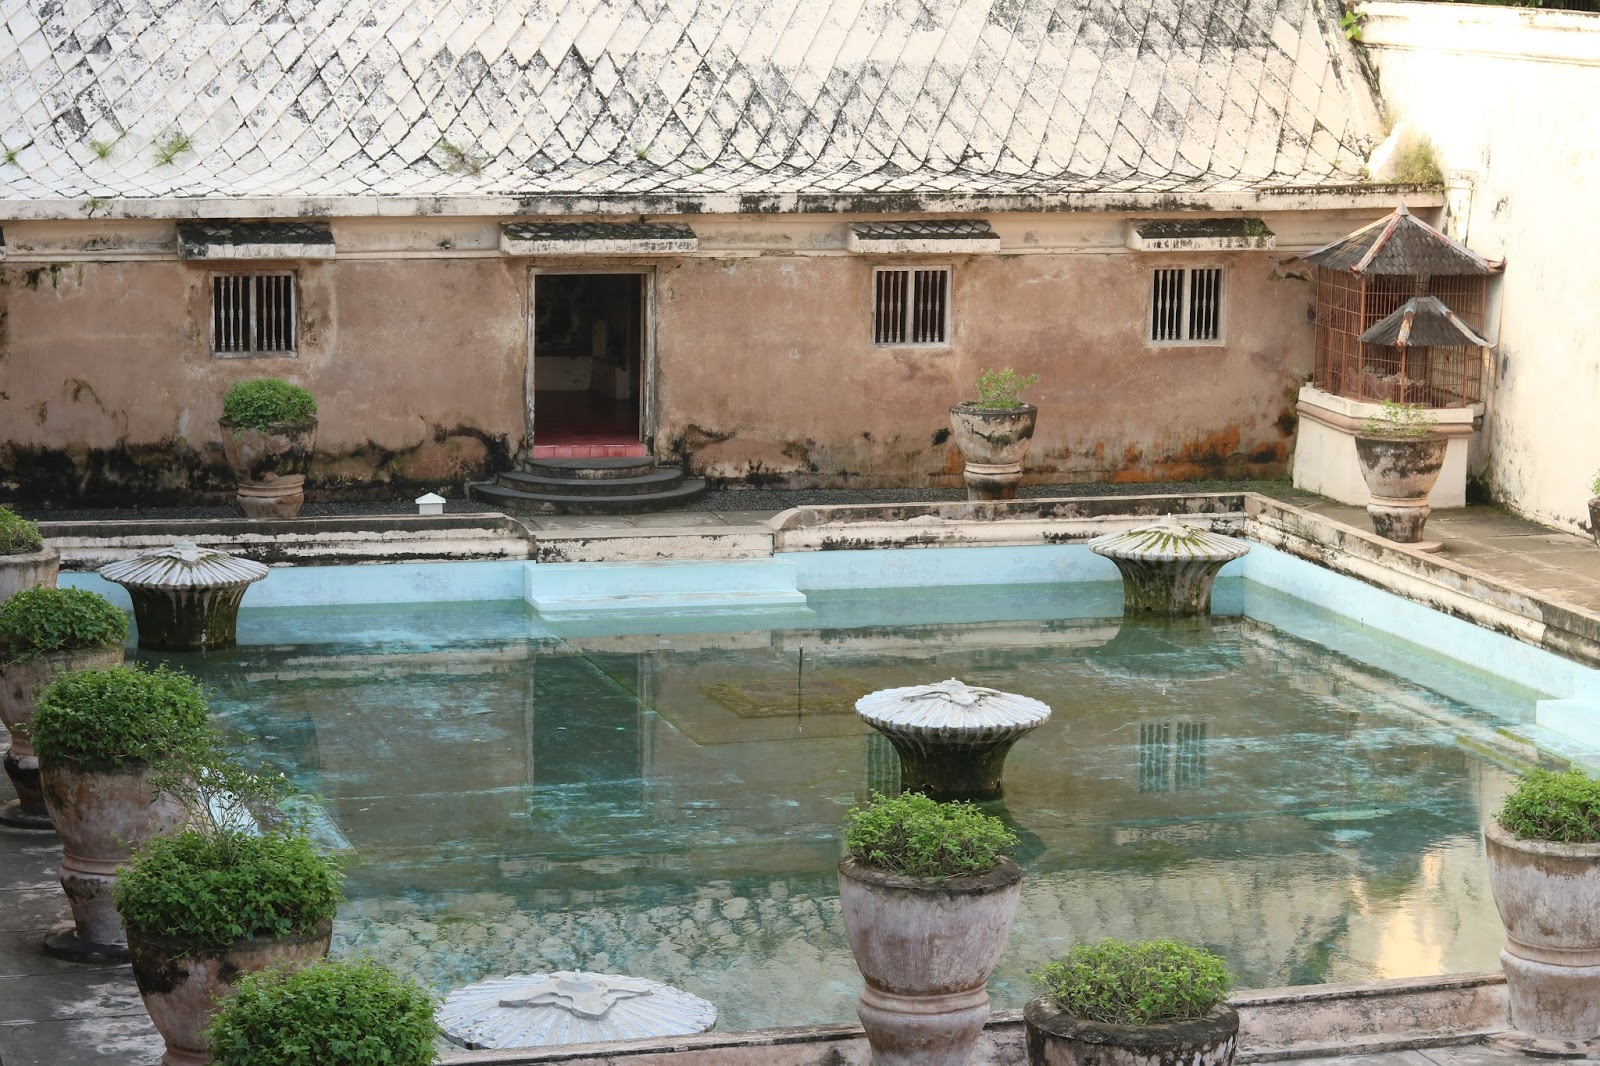 Palácio da Água Kraton